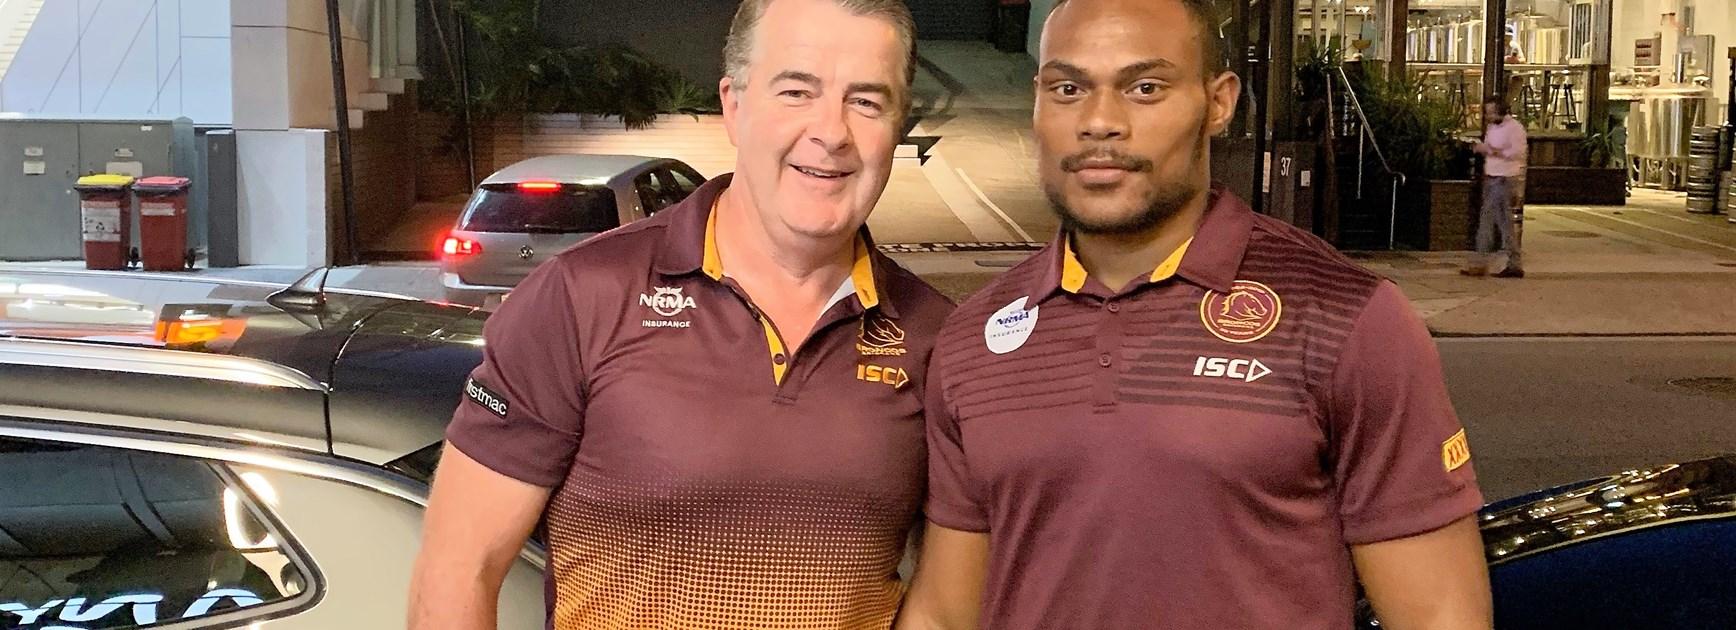 Brisbane's Fijian recruit Vudogo following Radradra path